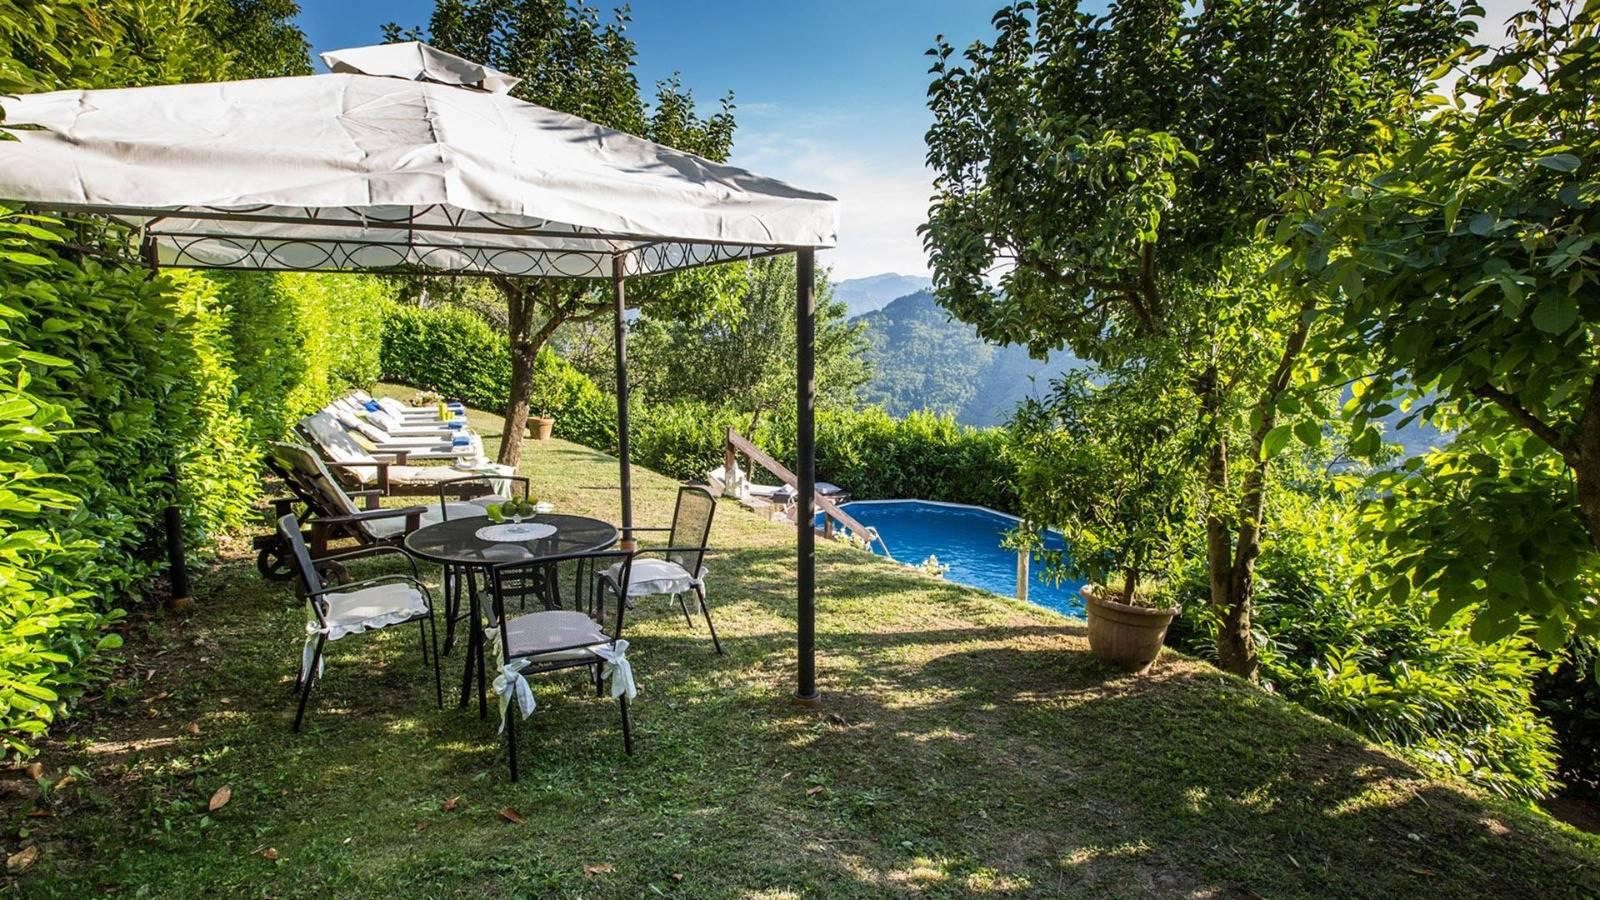 Giardino con piscina - Garden with swimming pool